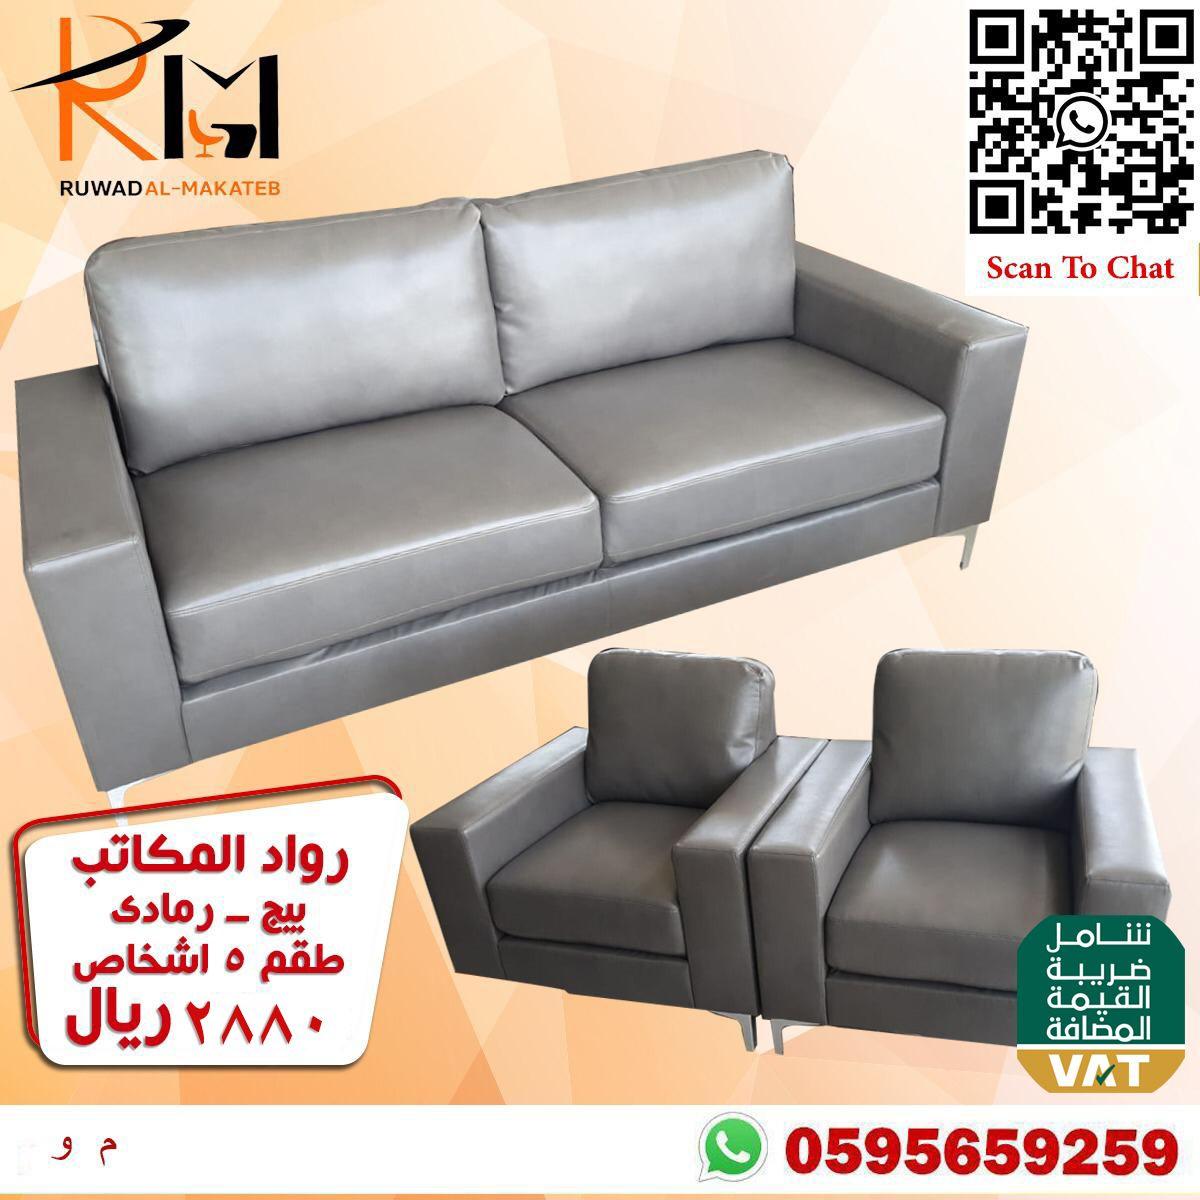 طقم كنب In 2021 Sofa Home Decor Furniture